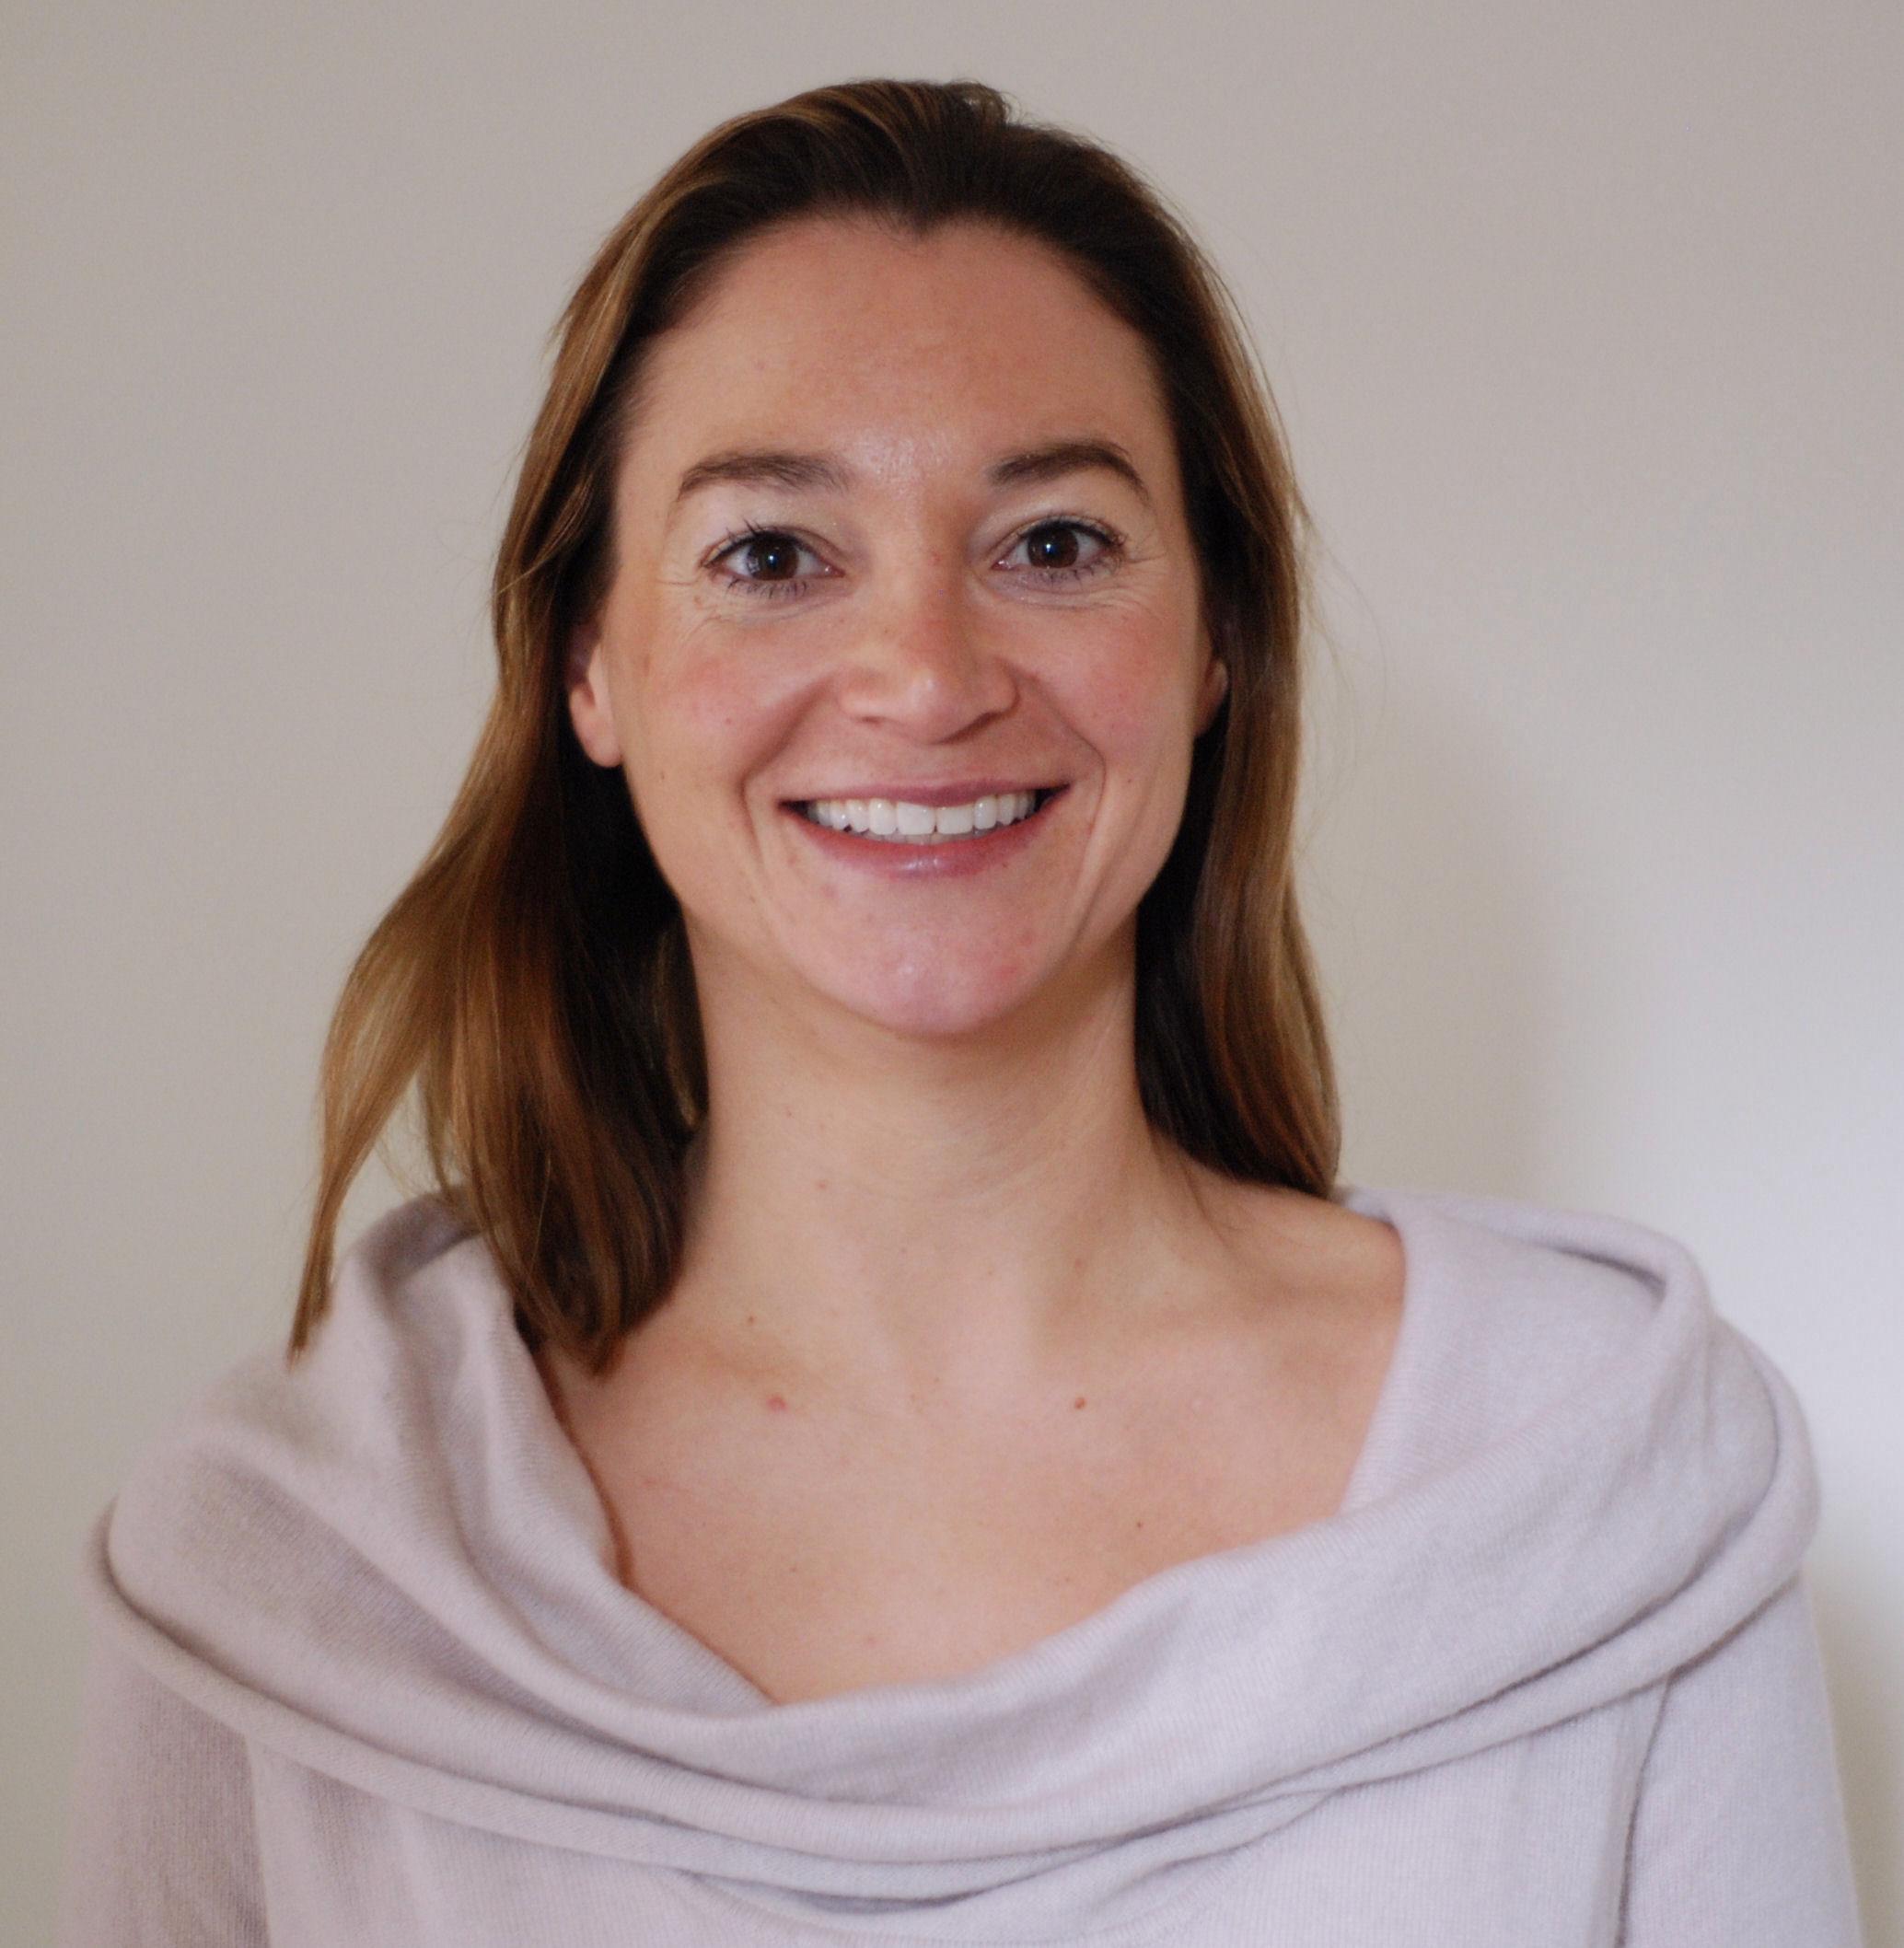 Anne-Katrin Schlag Unitive Personal Development Coach